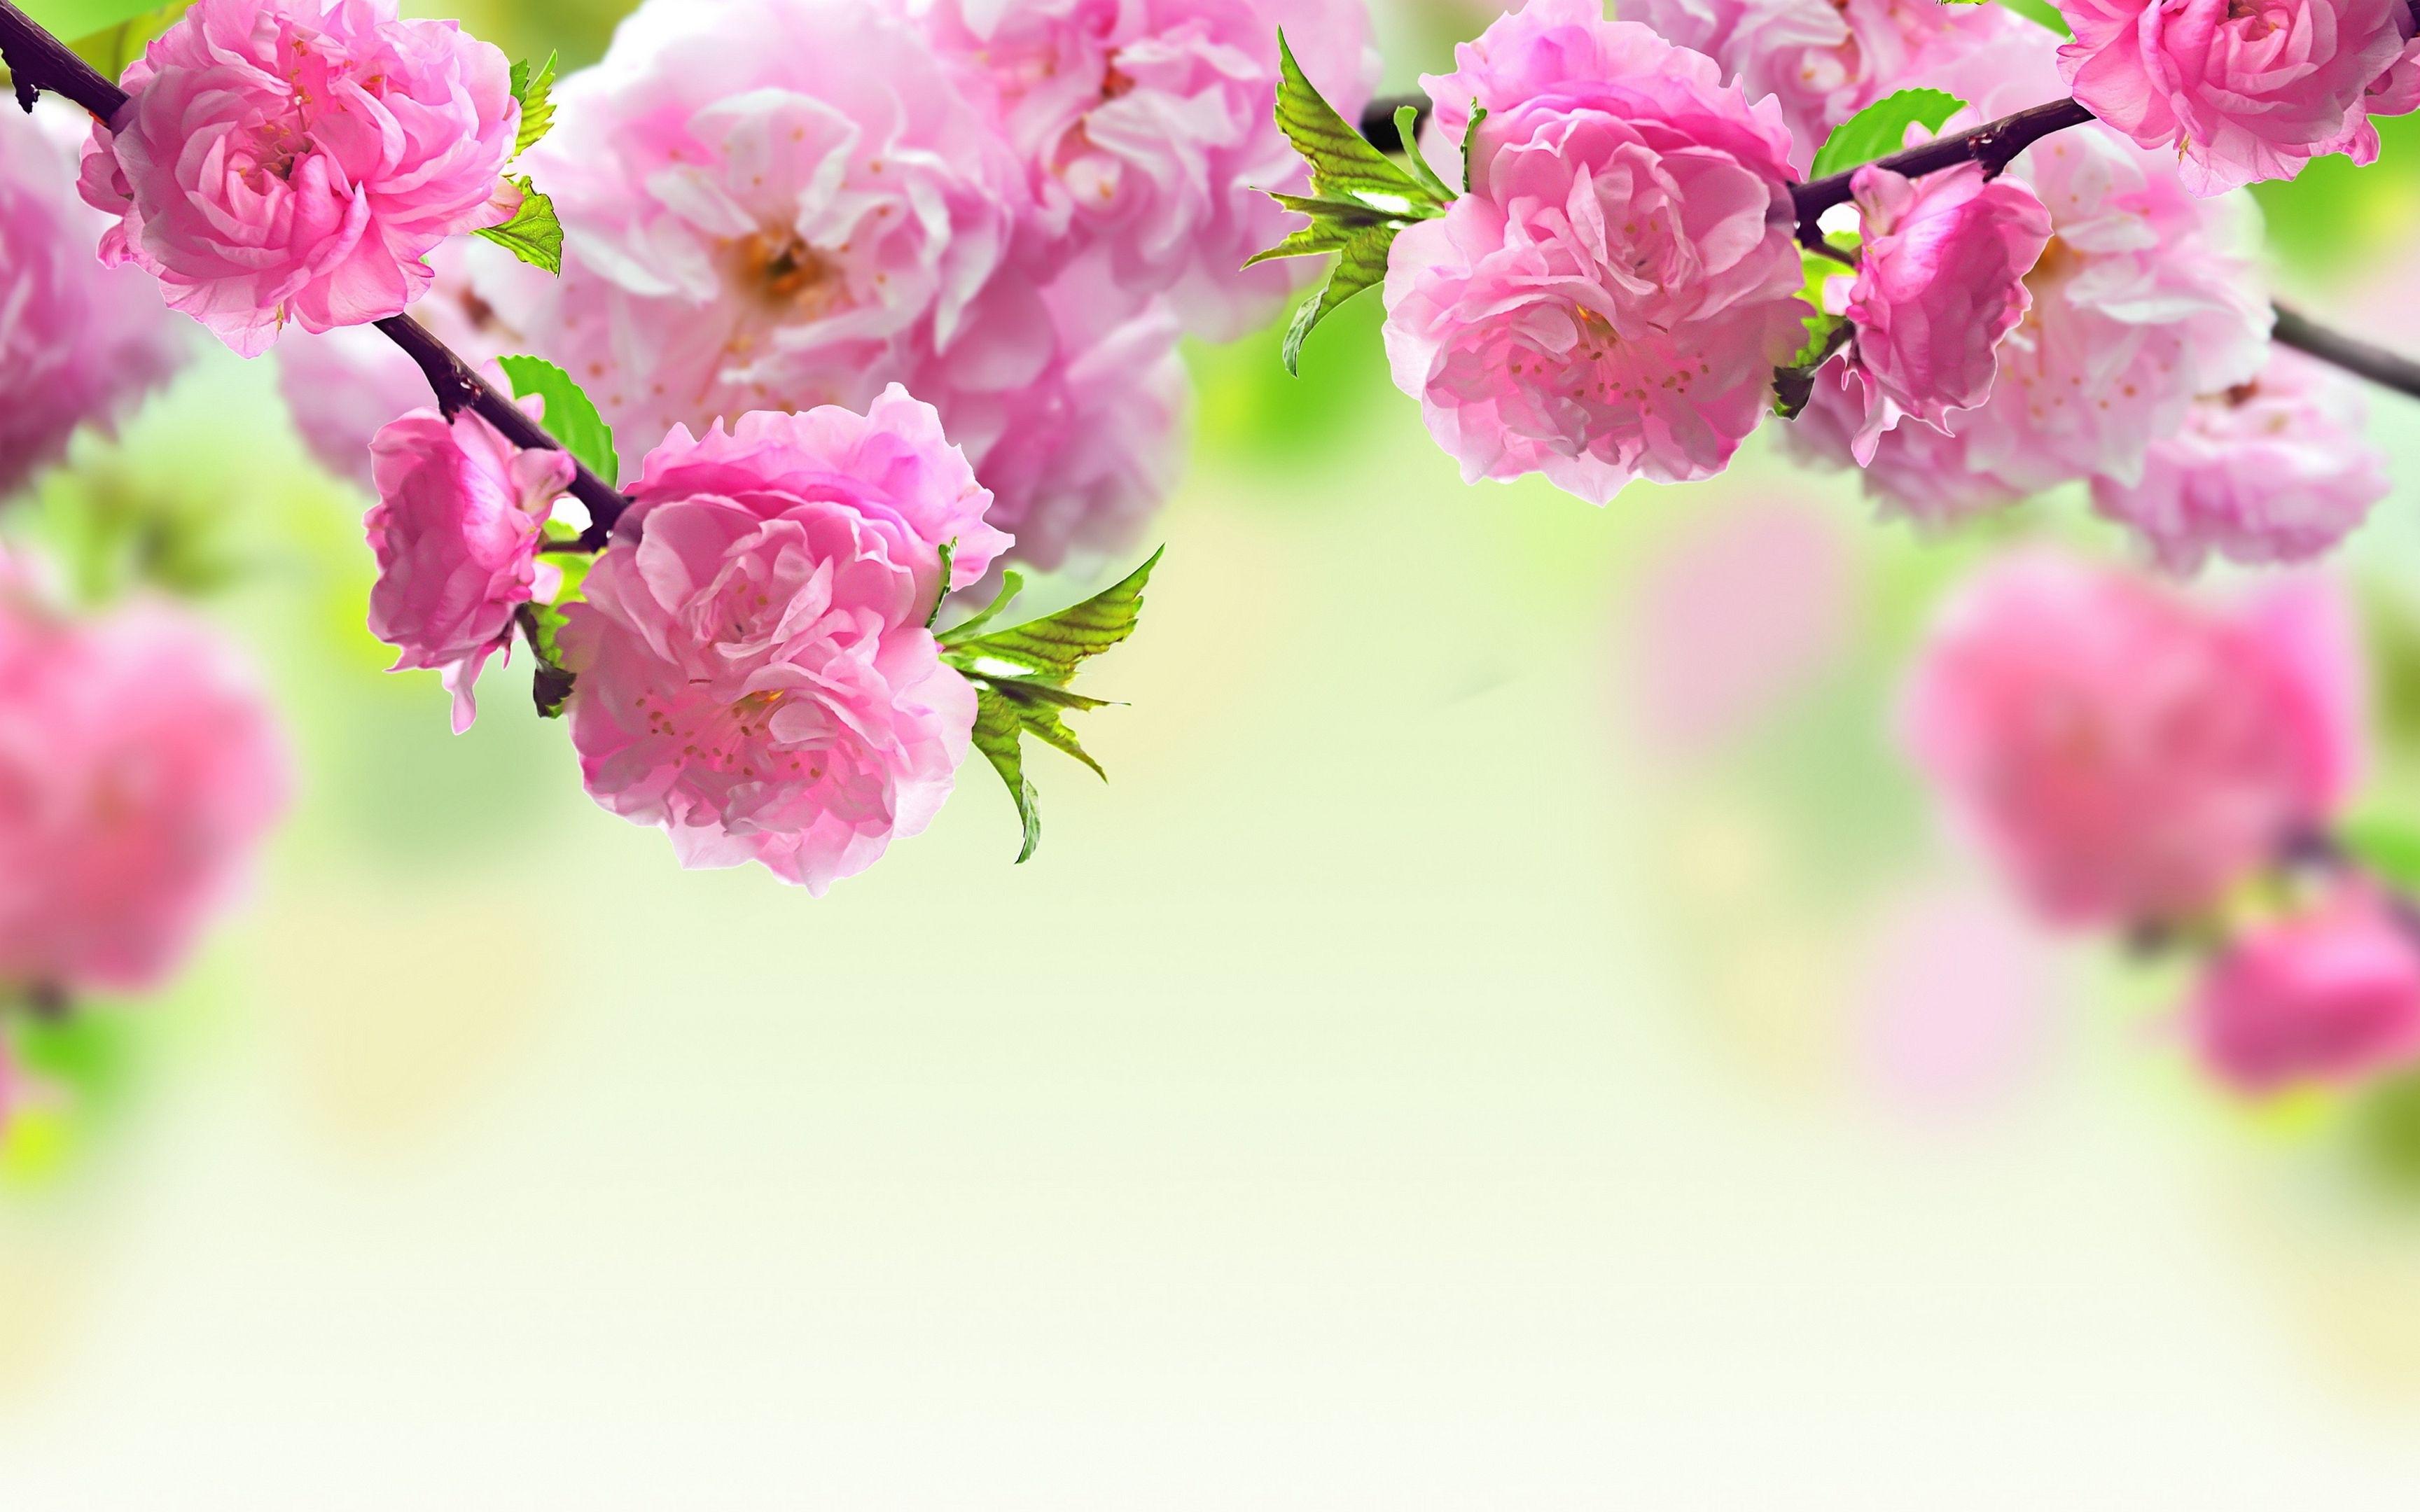 pinjames lee on wallpaper   pinterest   spring flowers, flower